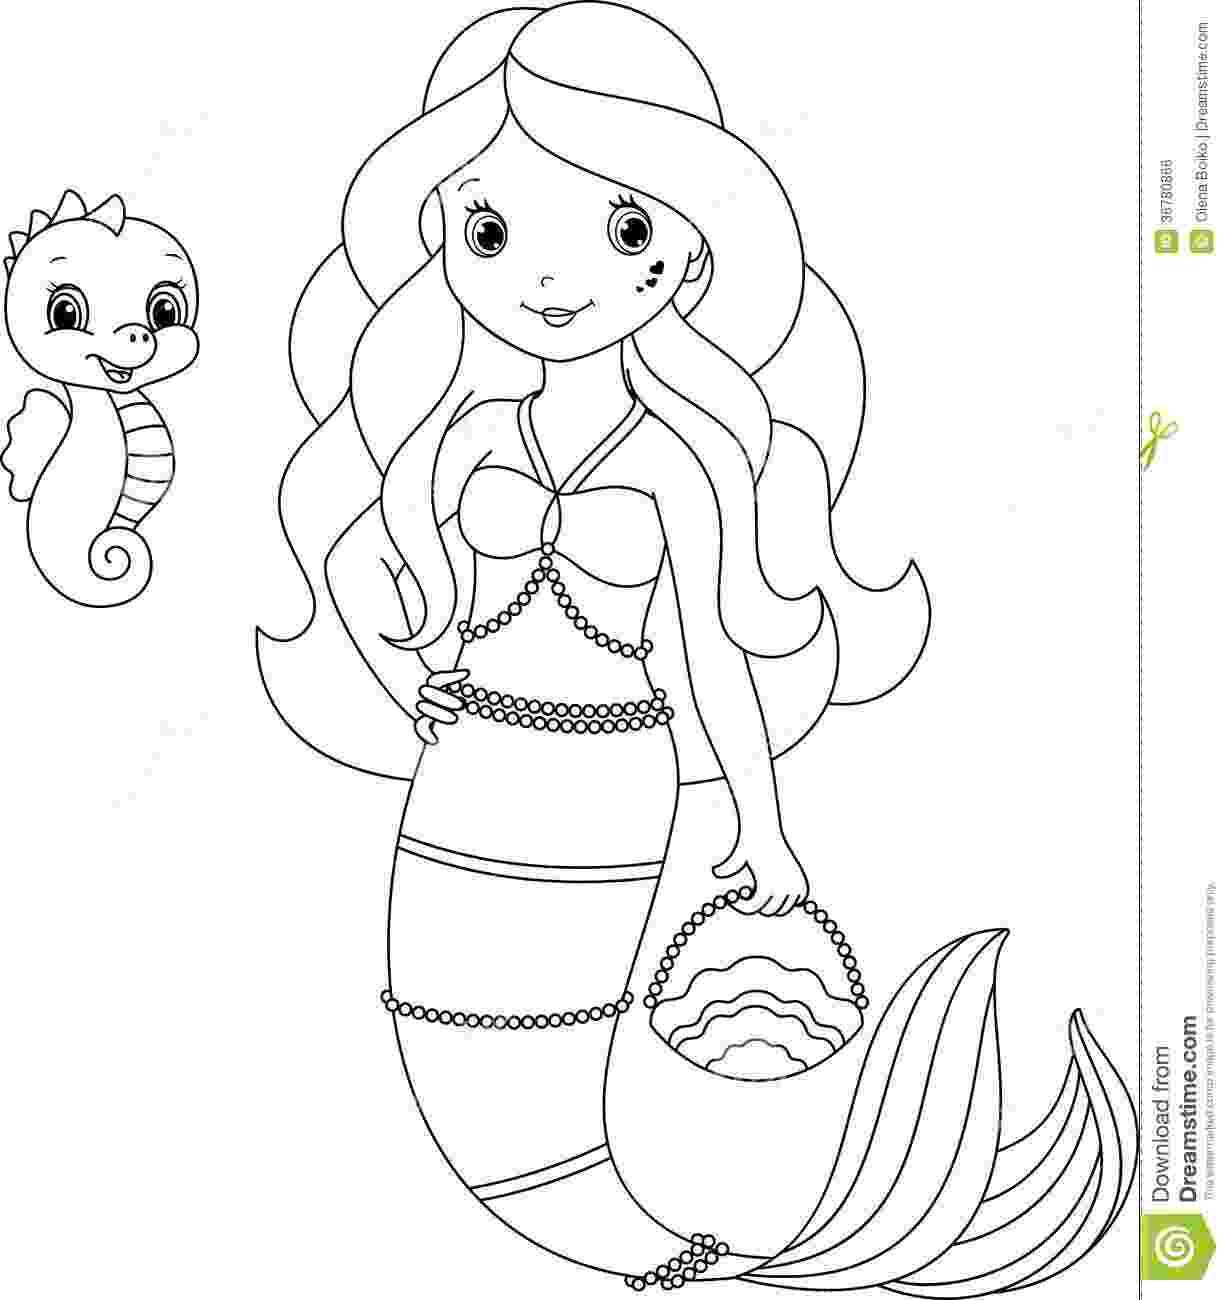 mermaid coloring page enchanted designs fairy mermaid blog free mermaid mermaid coloring page